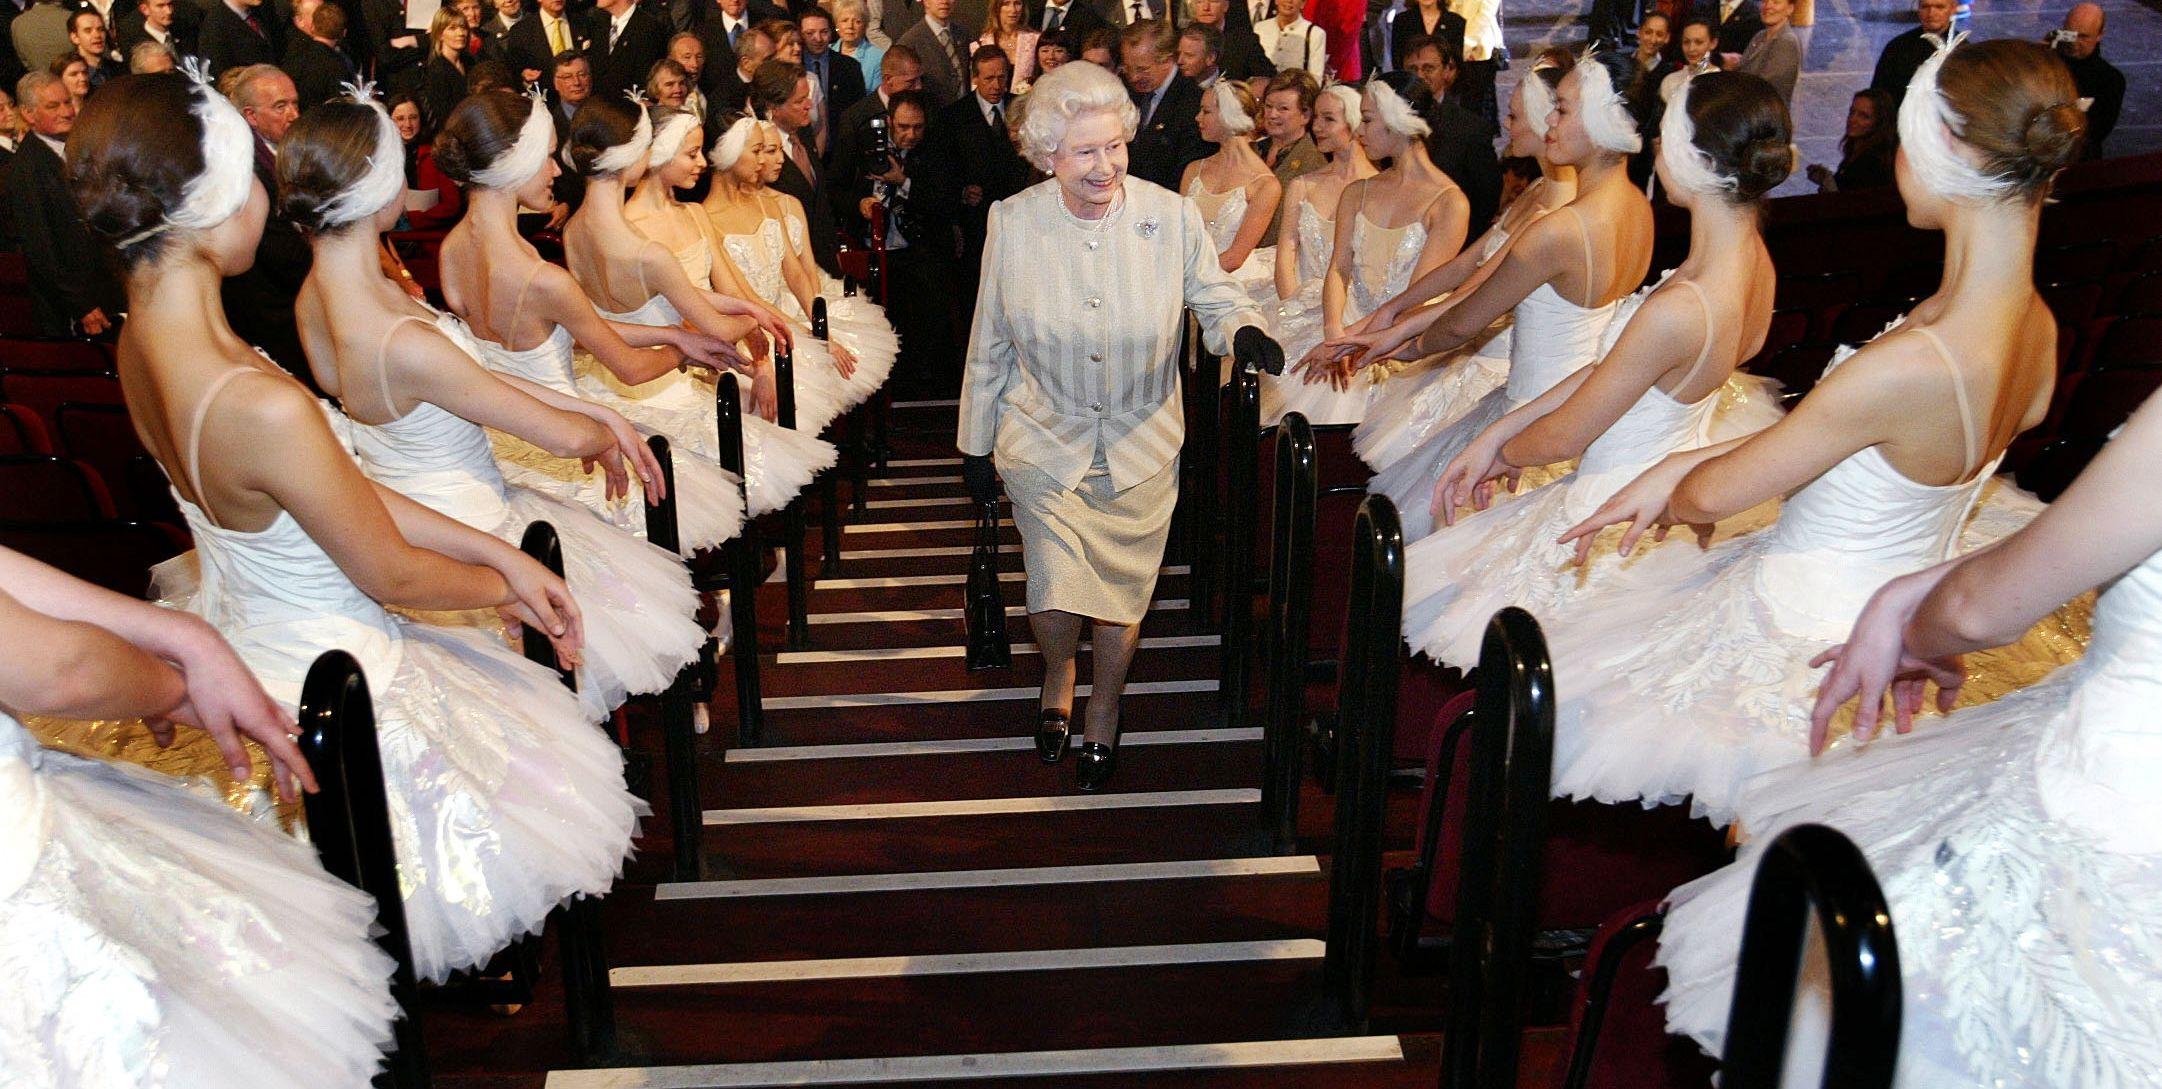 25 Beautiful Photos of the Royal Family at the Ballet